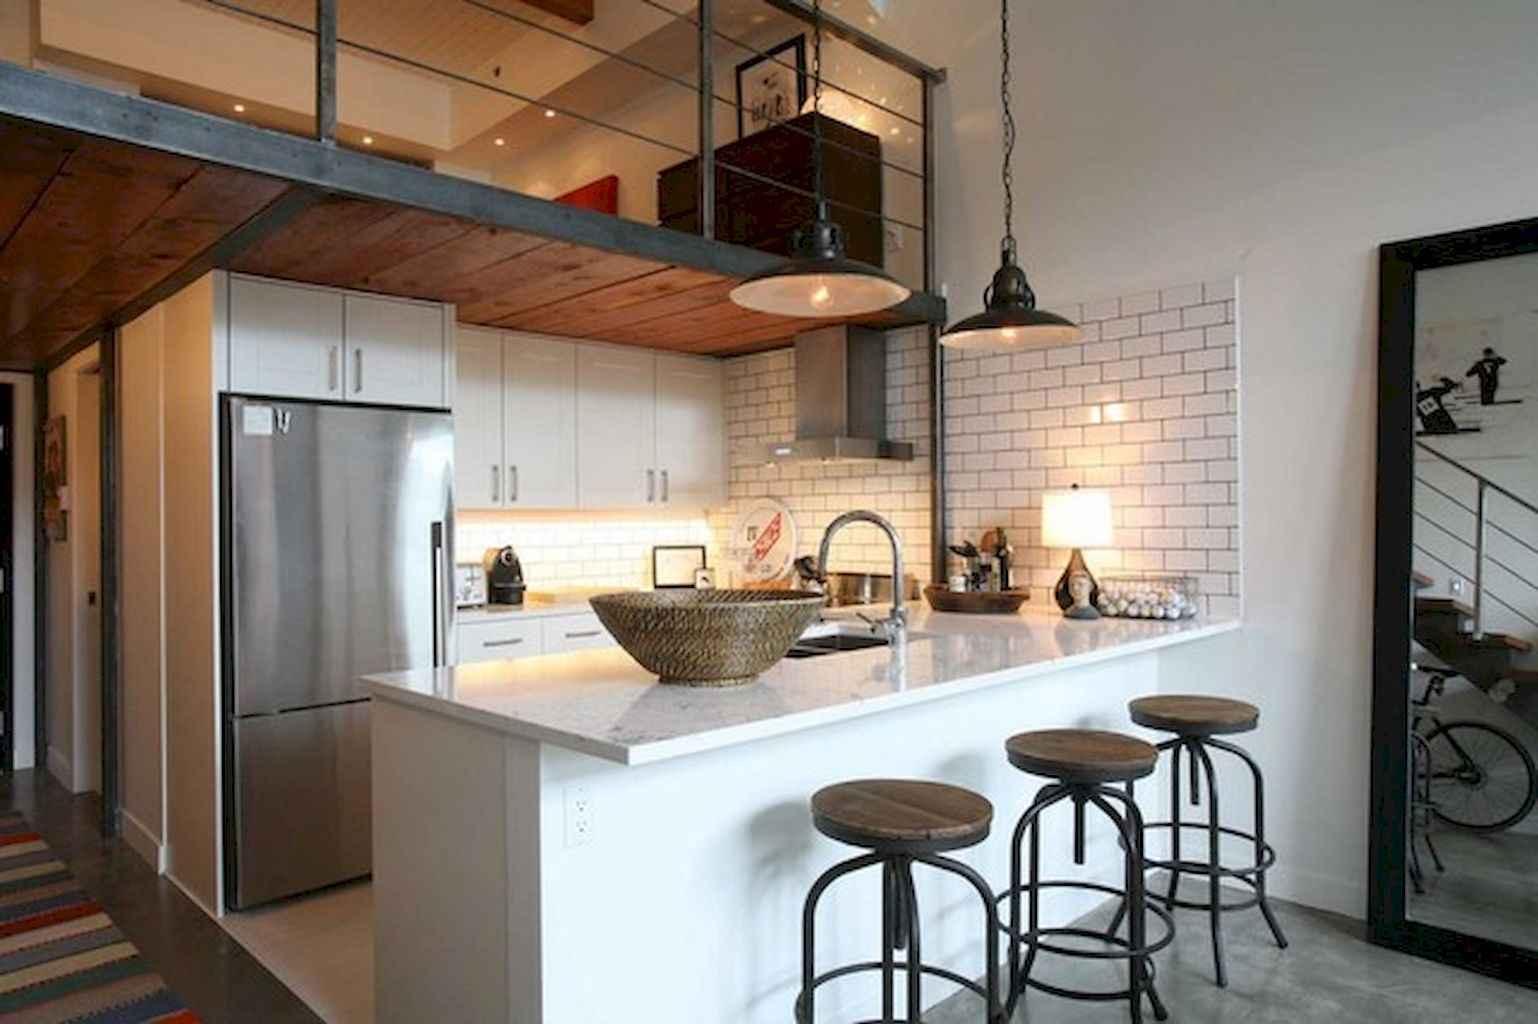 Cool creative loft apartment decorating ideas (41)